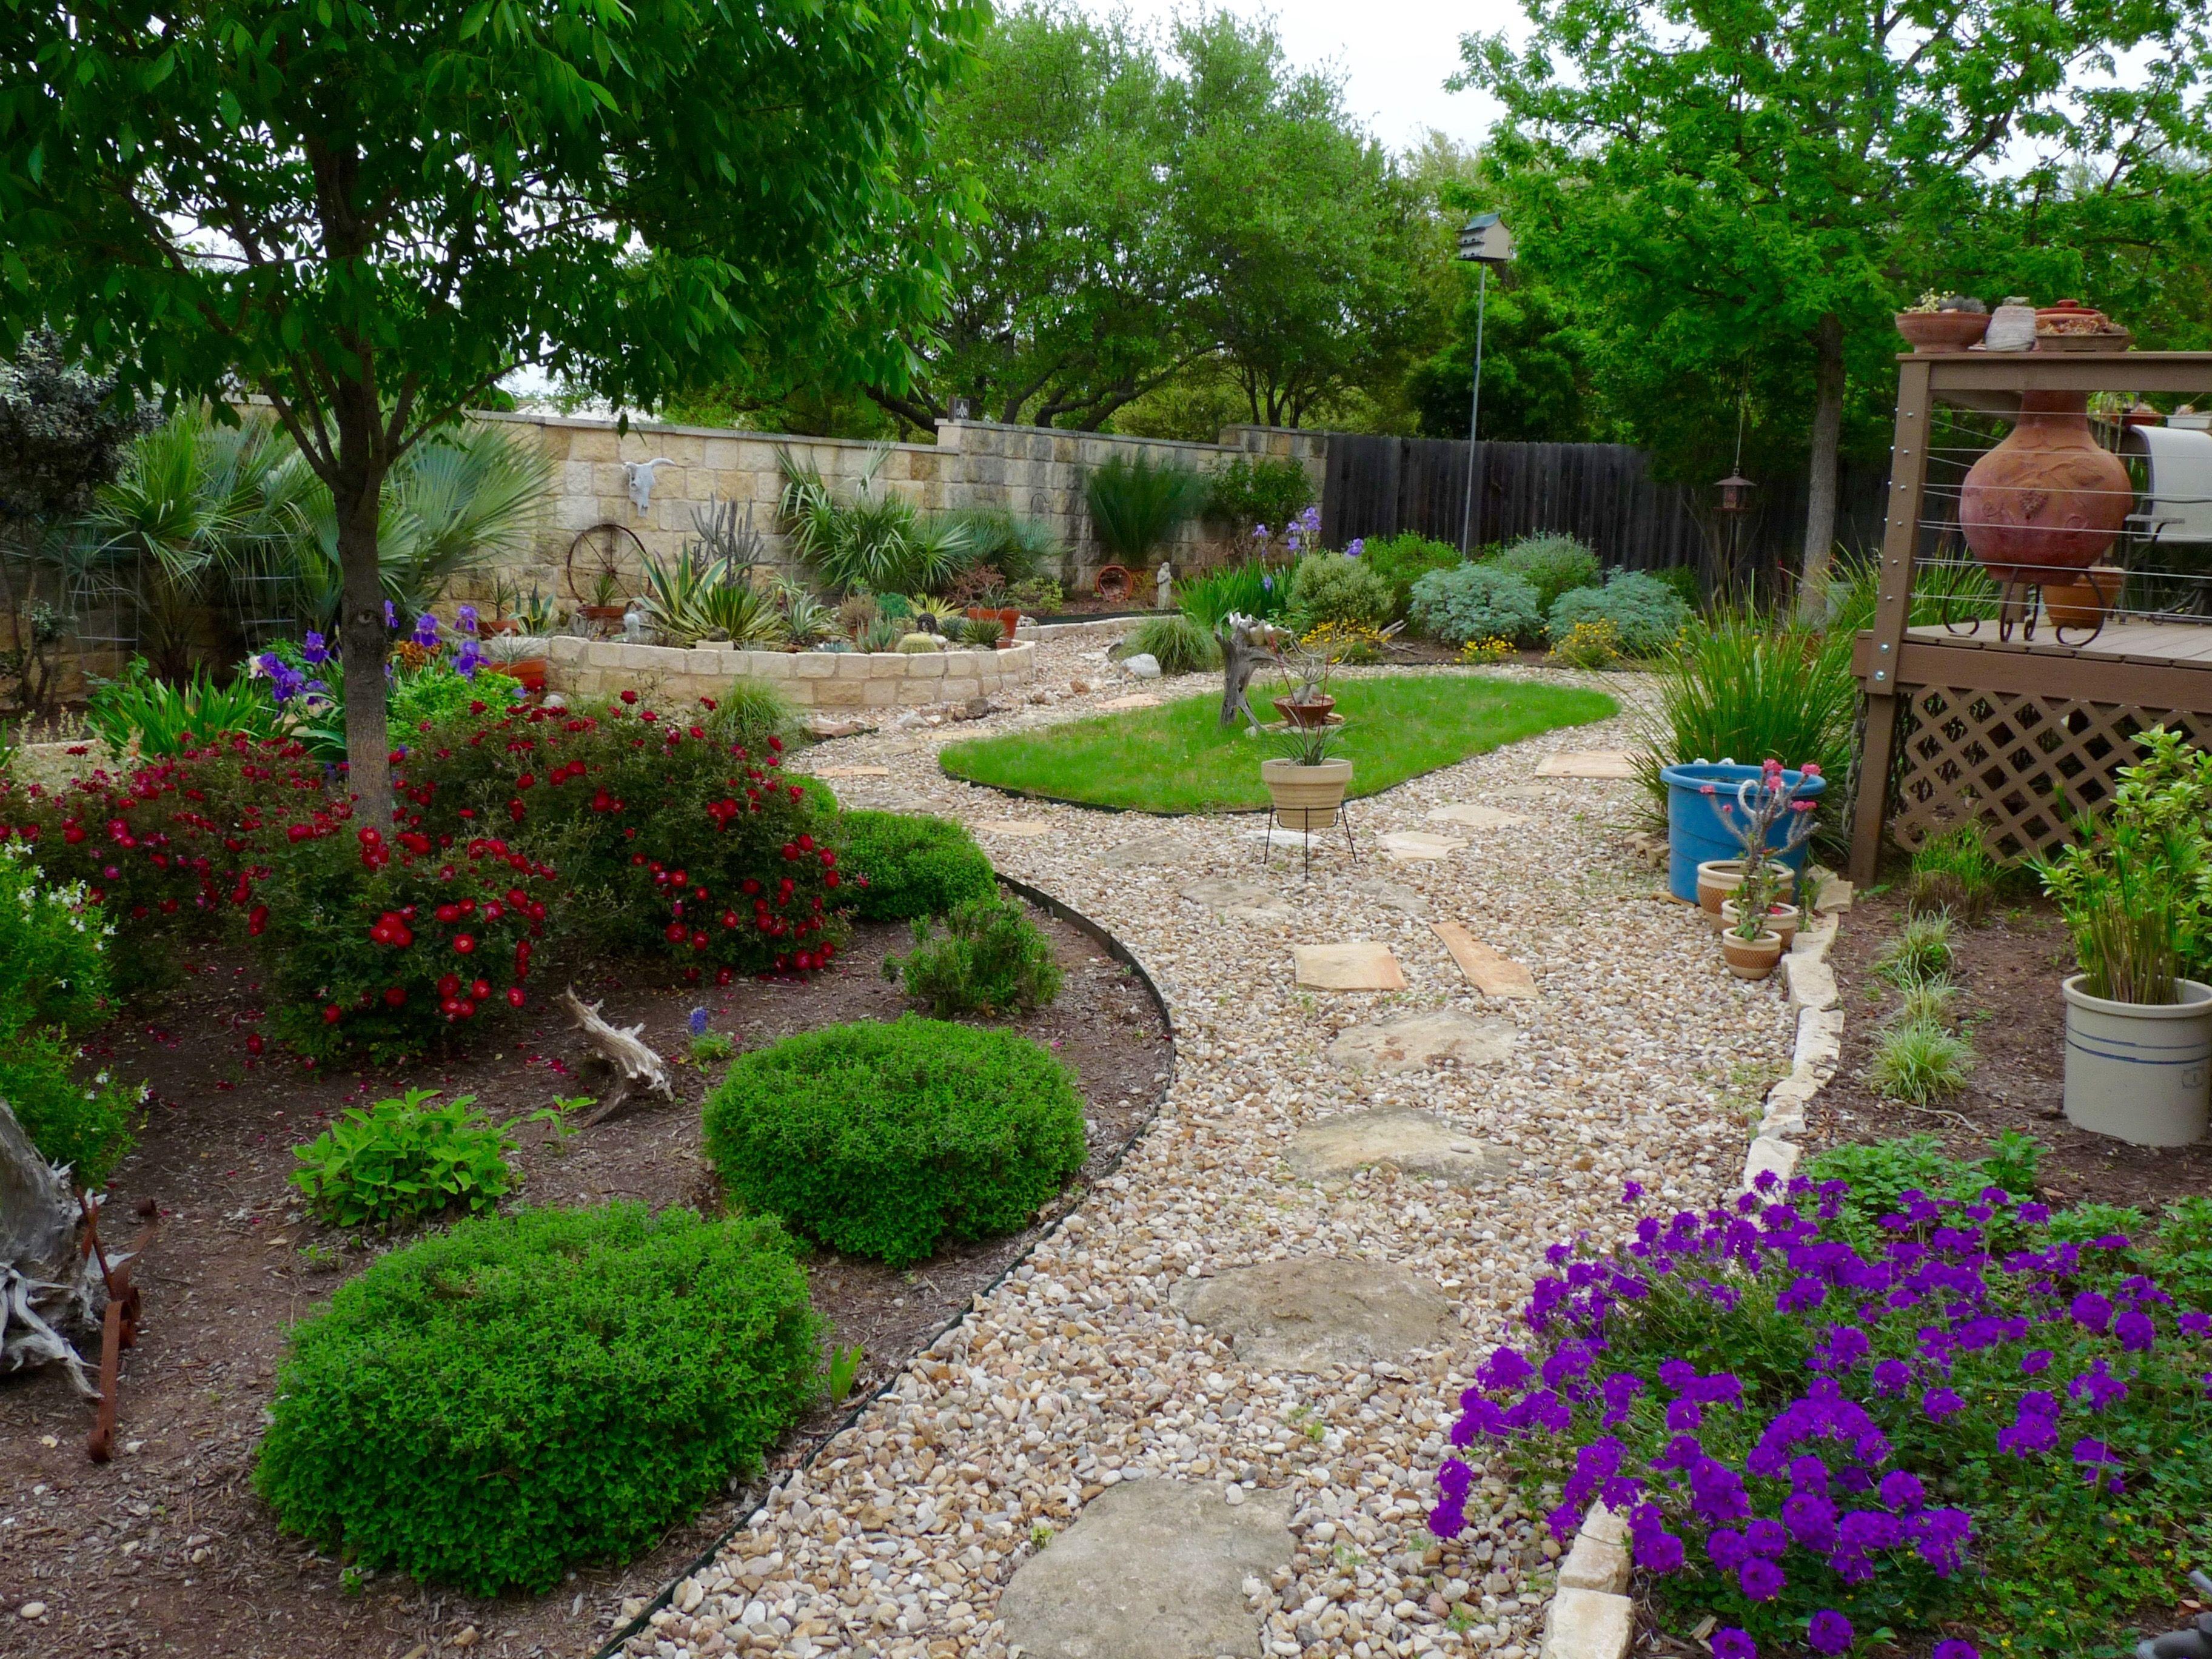 Central Texas Gardening Texas Landscaping Backyard Texas Landscaping Texas Gardening